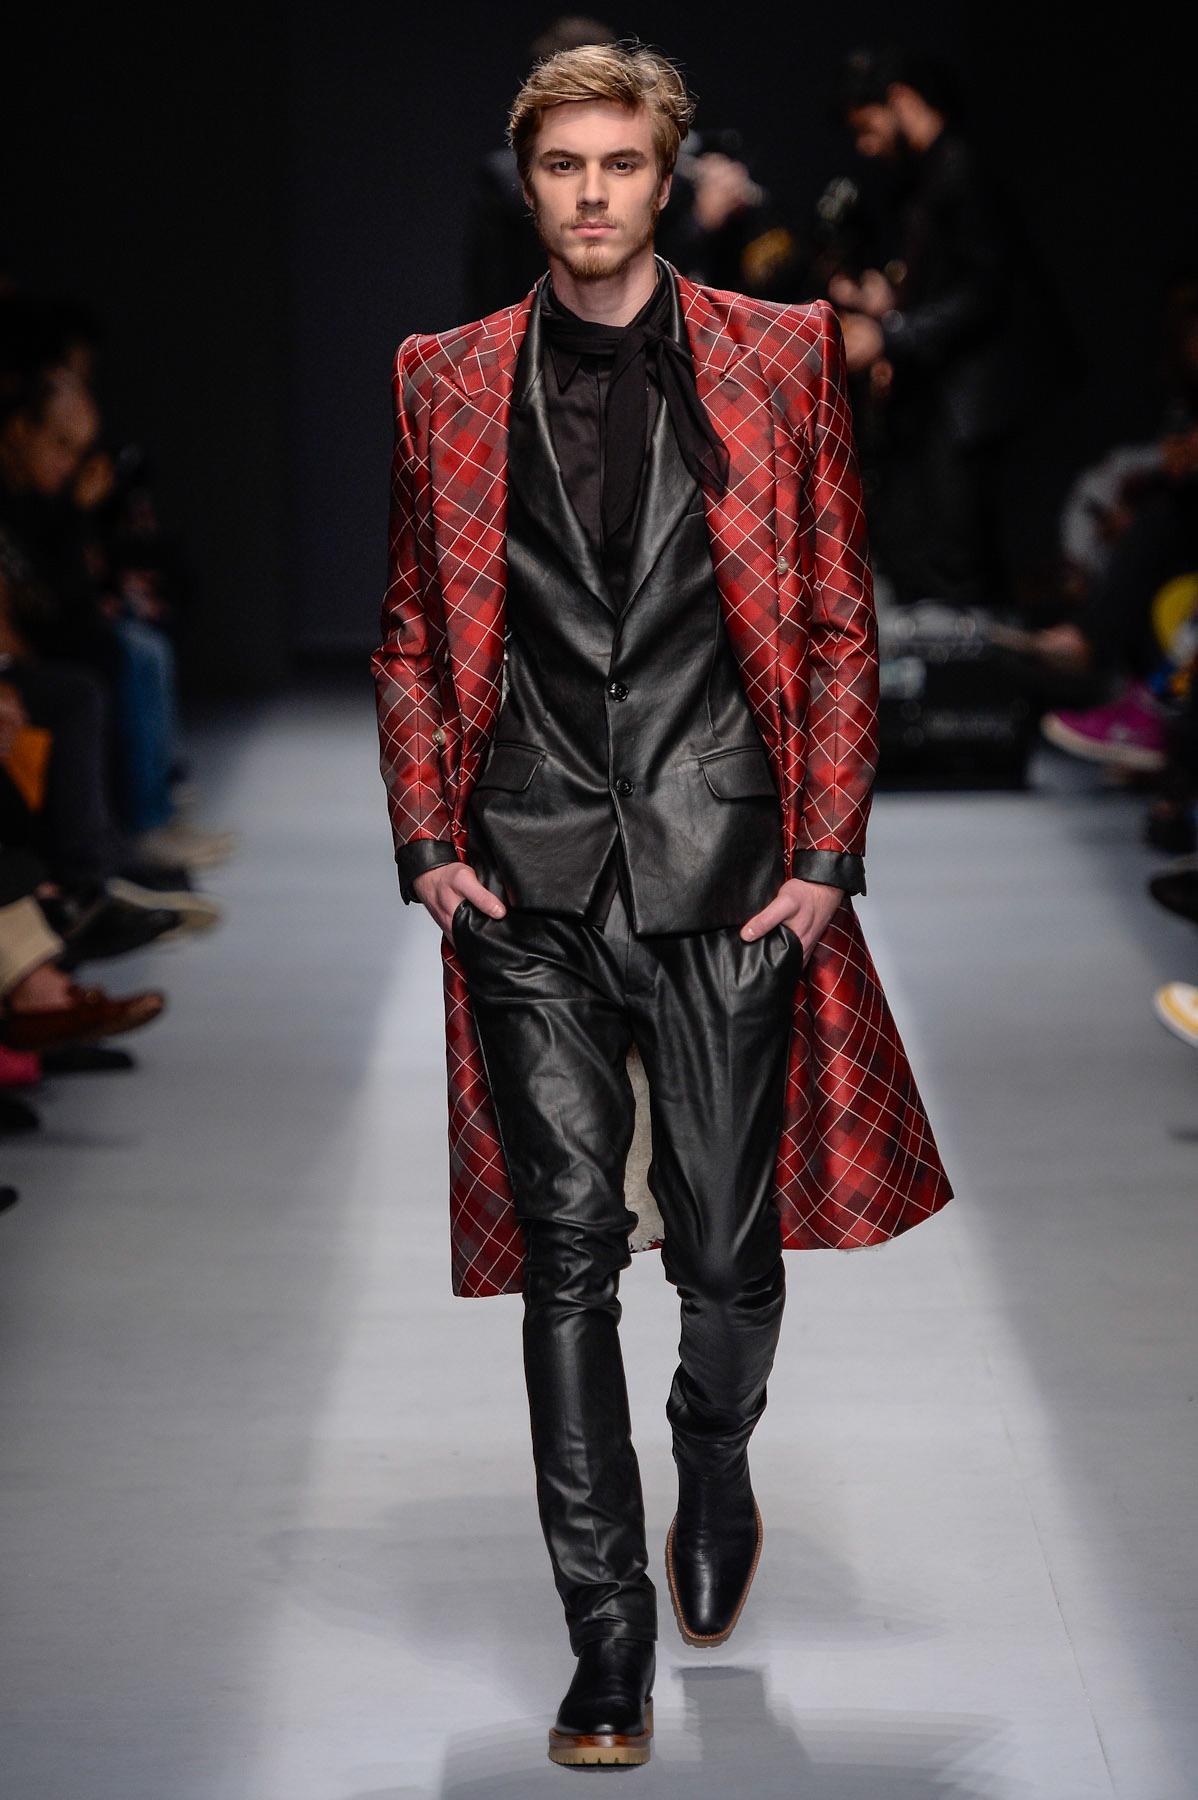 Cole o jo o pimenta spfw inverno 2014 rtw Good style fashion show cleveland